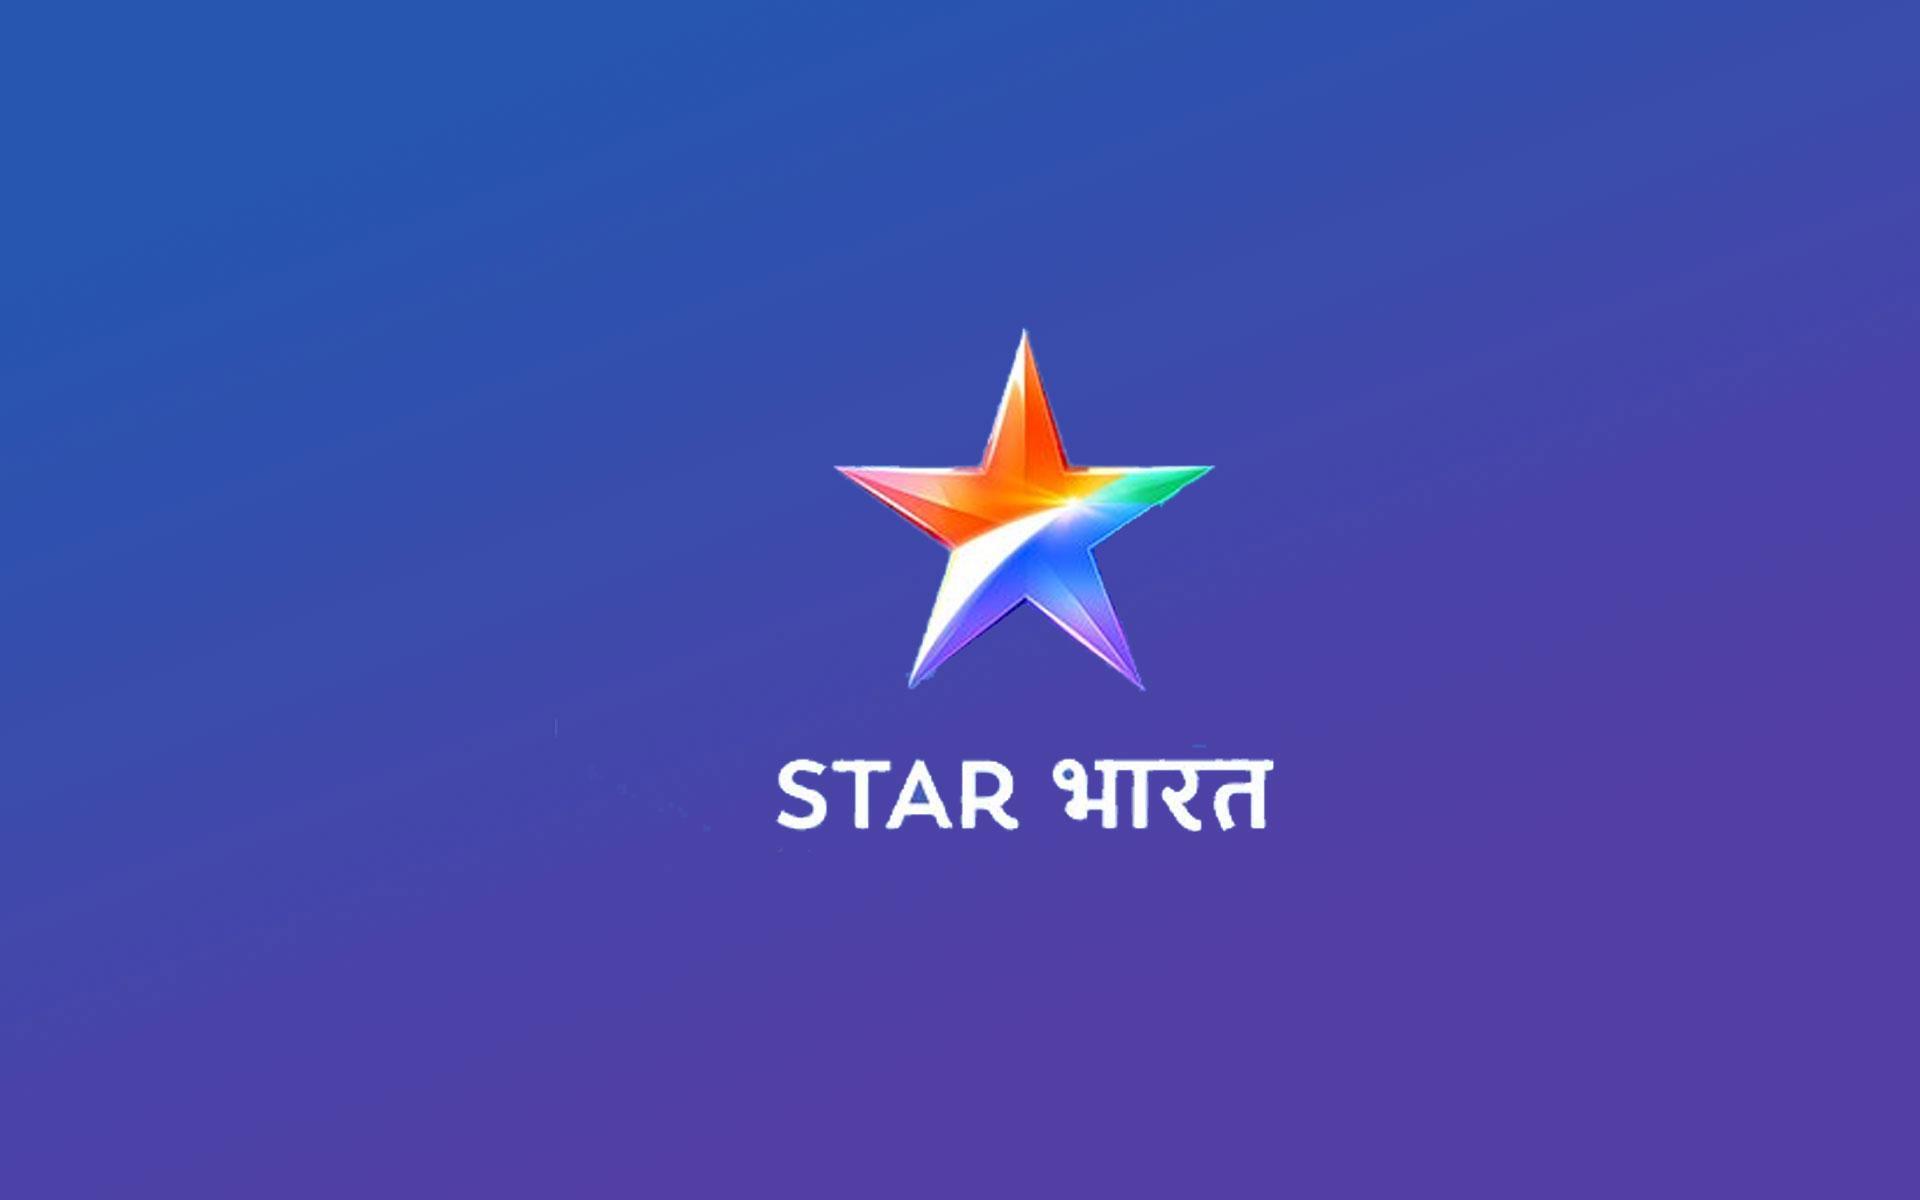 Star Bharat Wallpapers - Wallpaper Cave